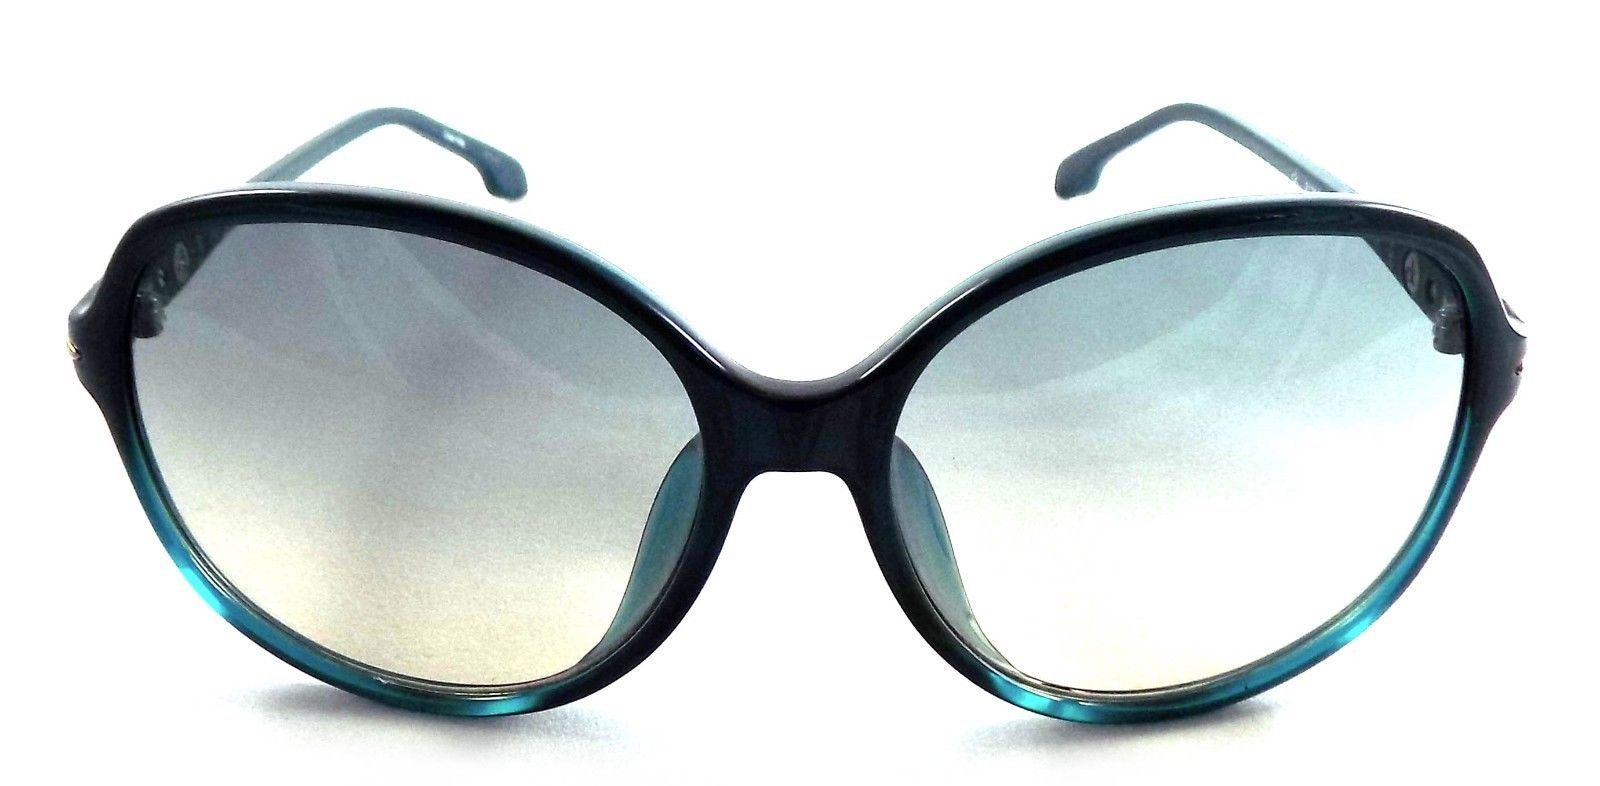 GENUINE Calvin Klein Sunglasses CK 3139S 279 59x16x130 Green / Gray Gradient